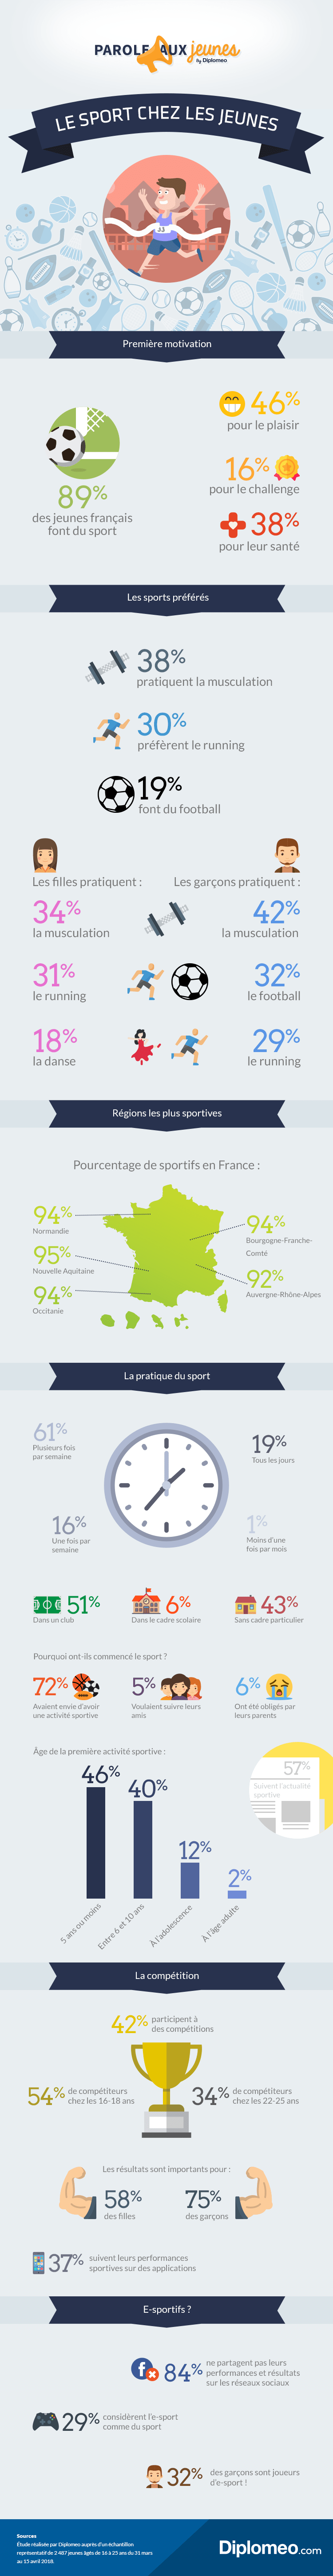 infographie sport